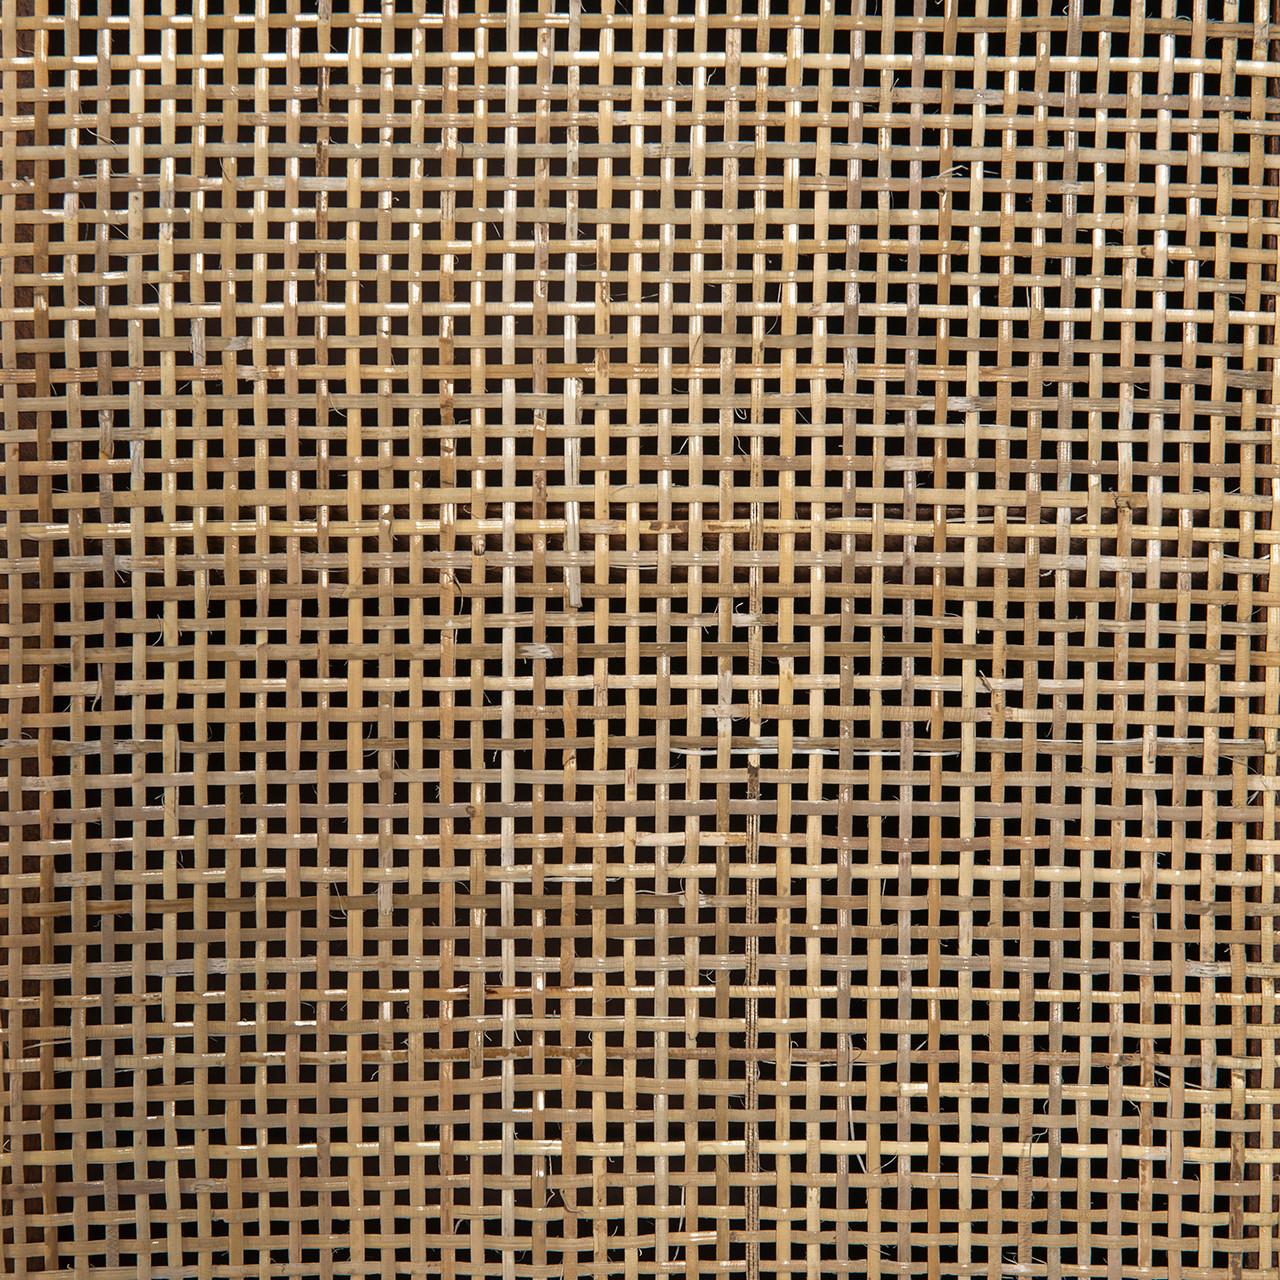 Goldie Sideboard - Toasted Acacia